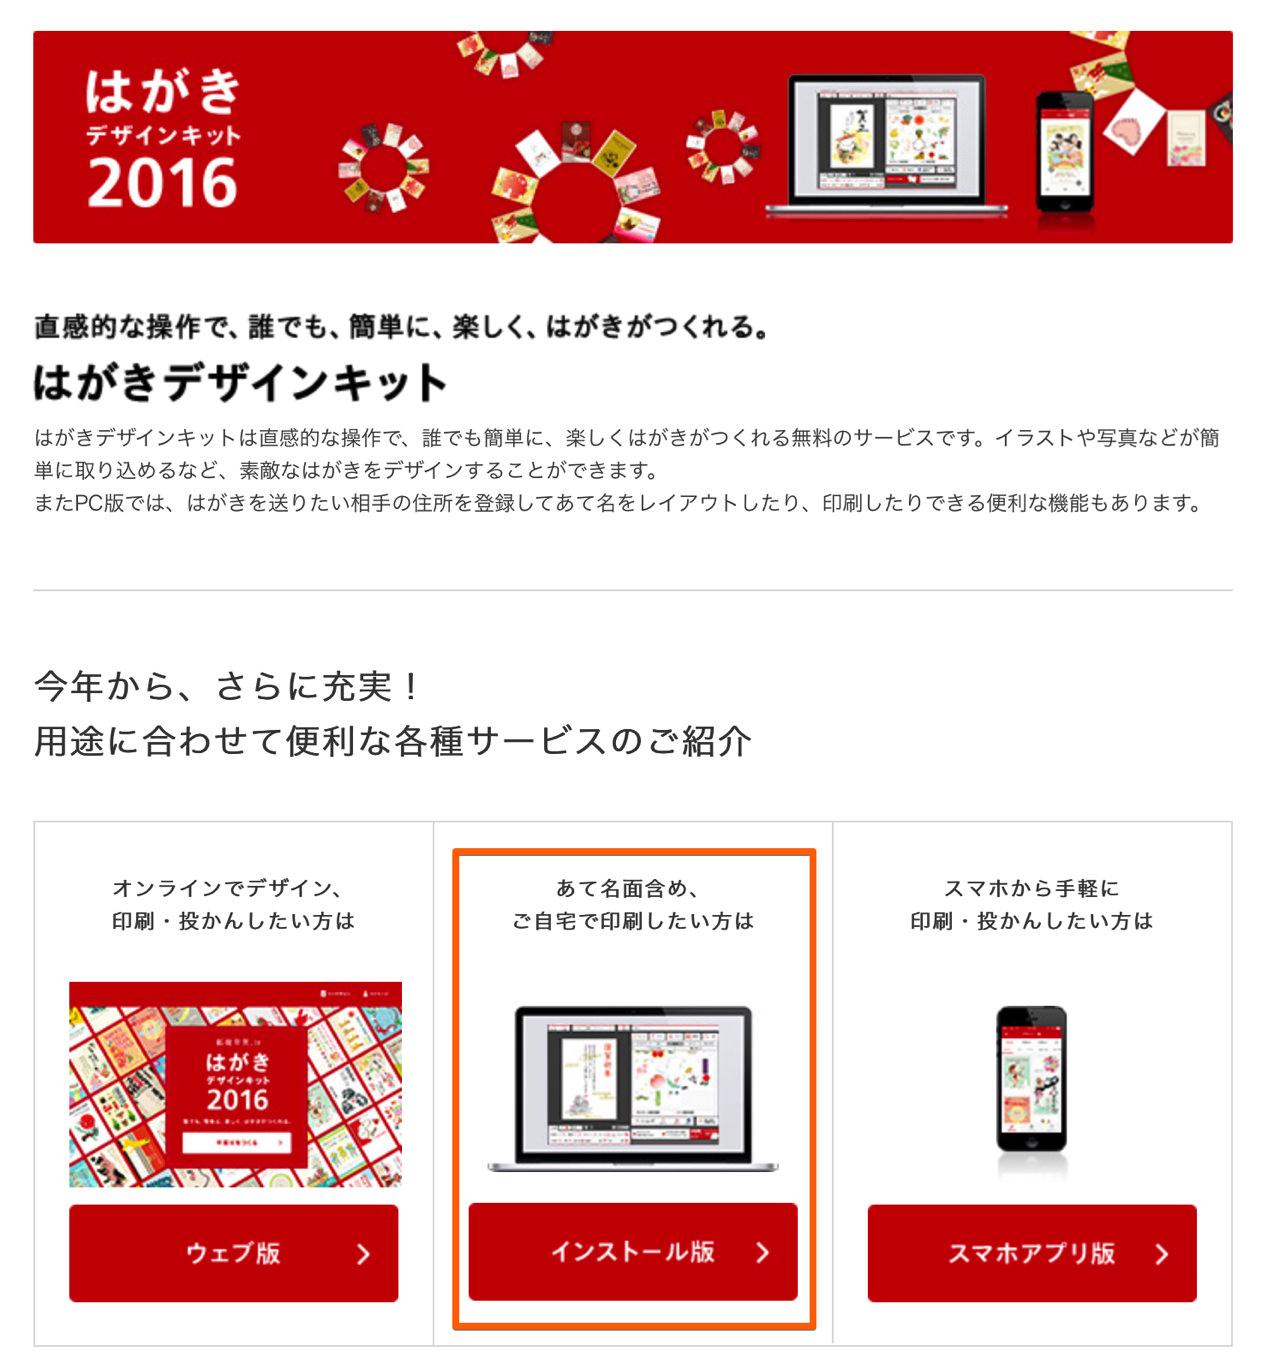 Hagaki design kit 201616